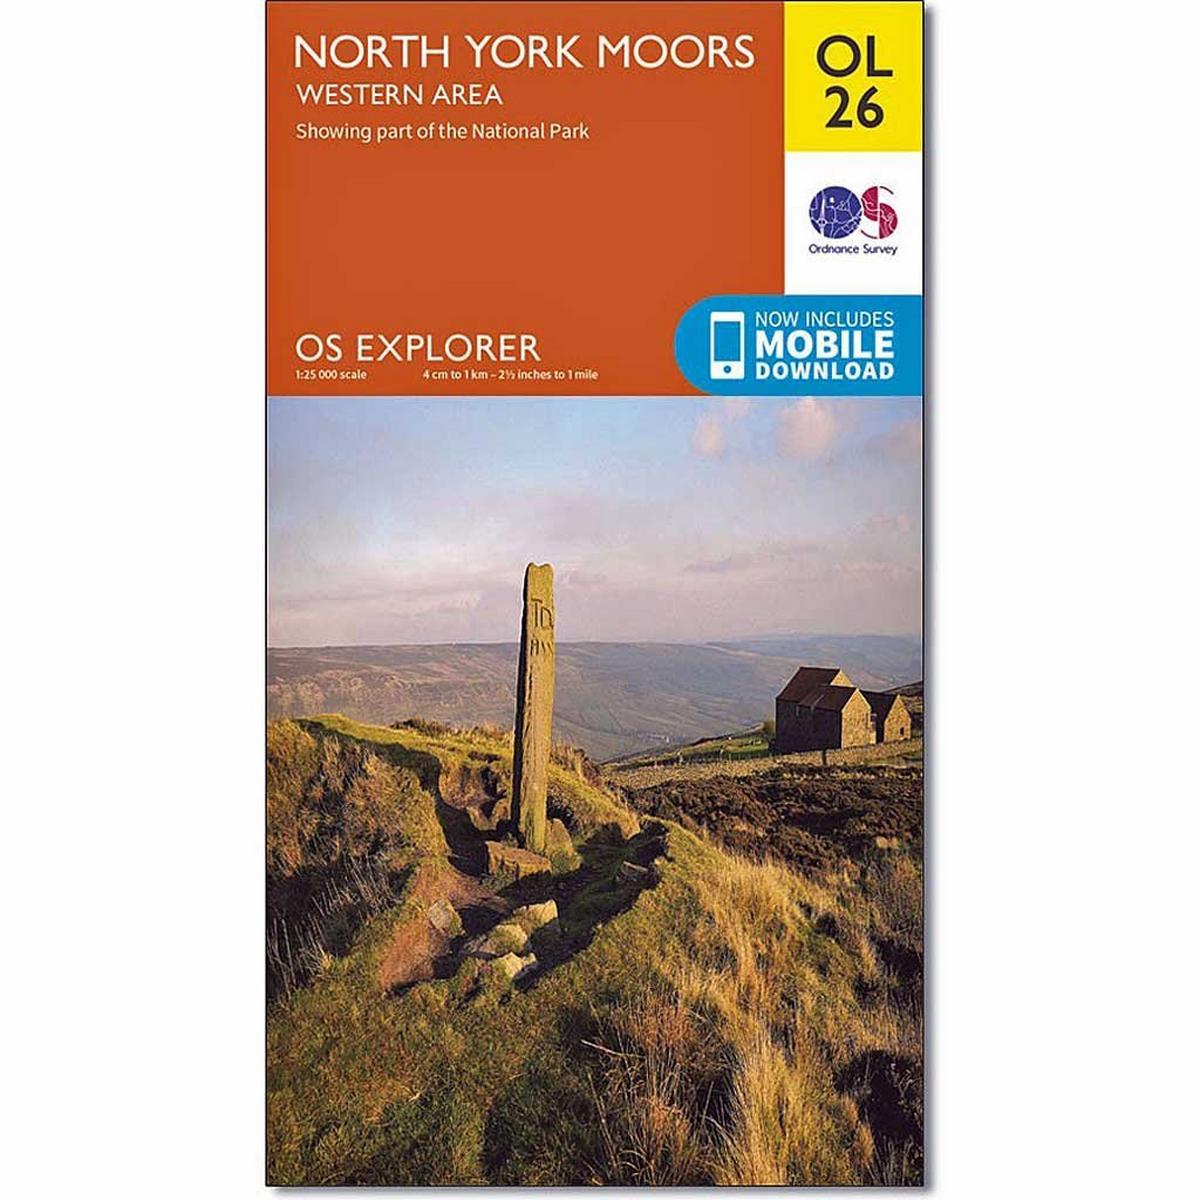 Ordnance Survey OS Explorer ACTIVE Map OL26 North York Moors - Western